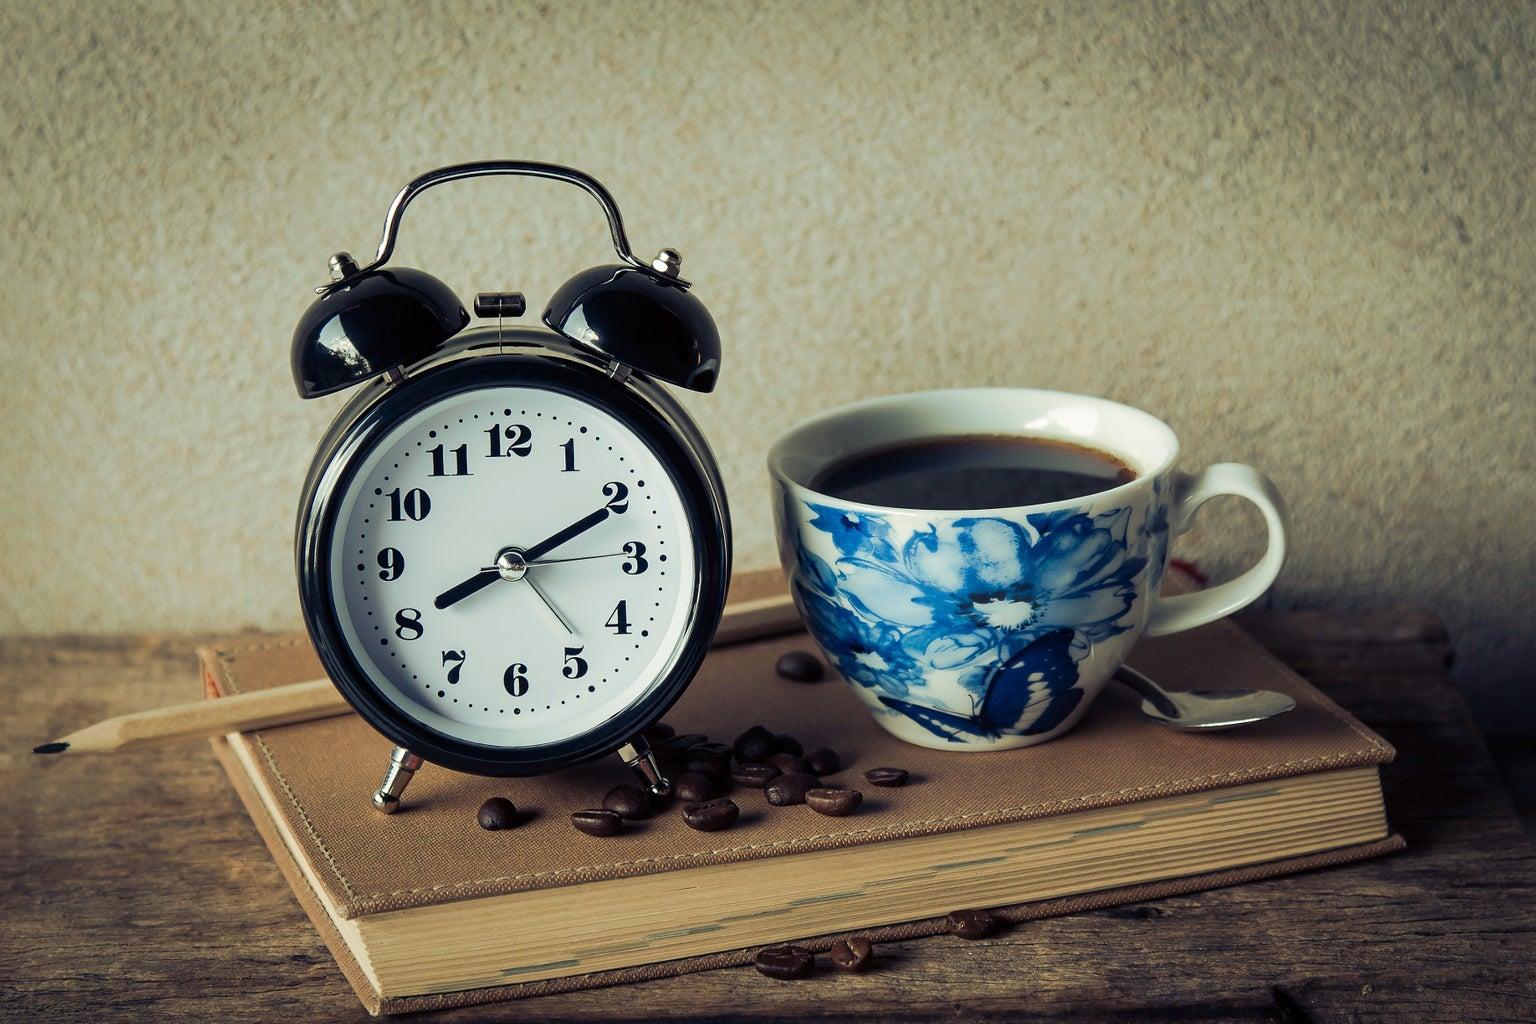 coffee in a blue pattern mug next to an analog alarm clock